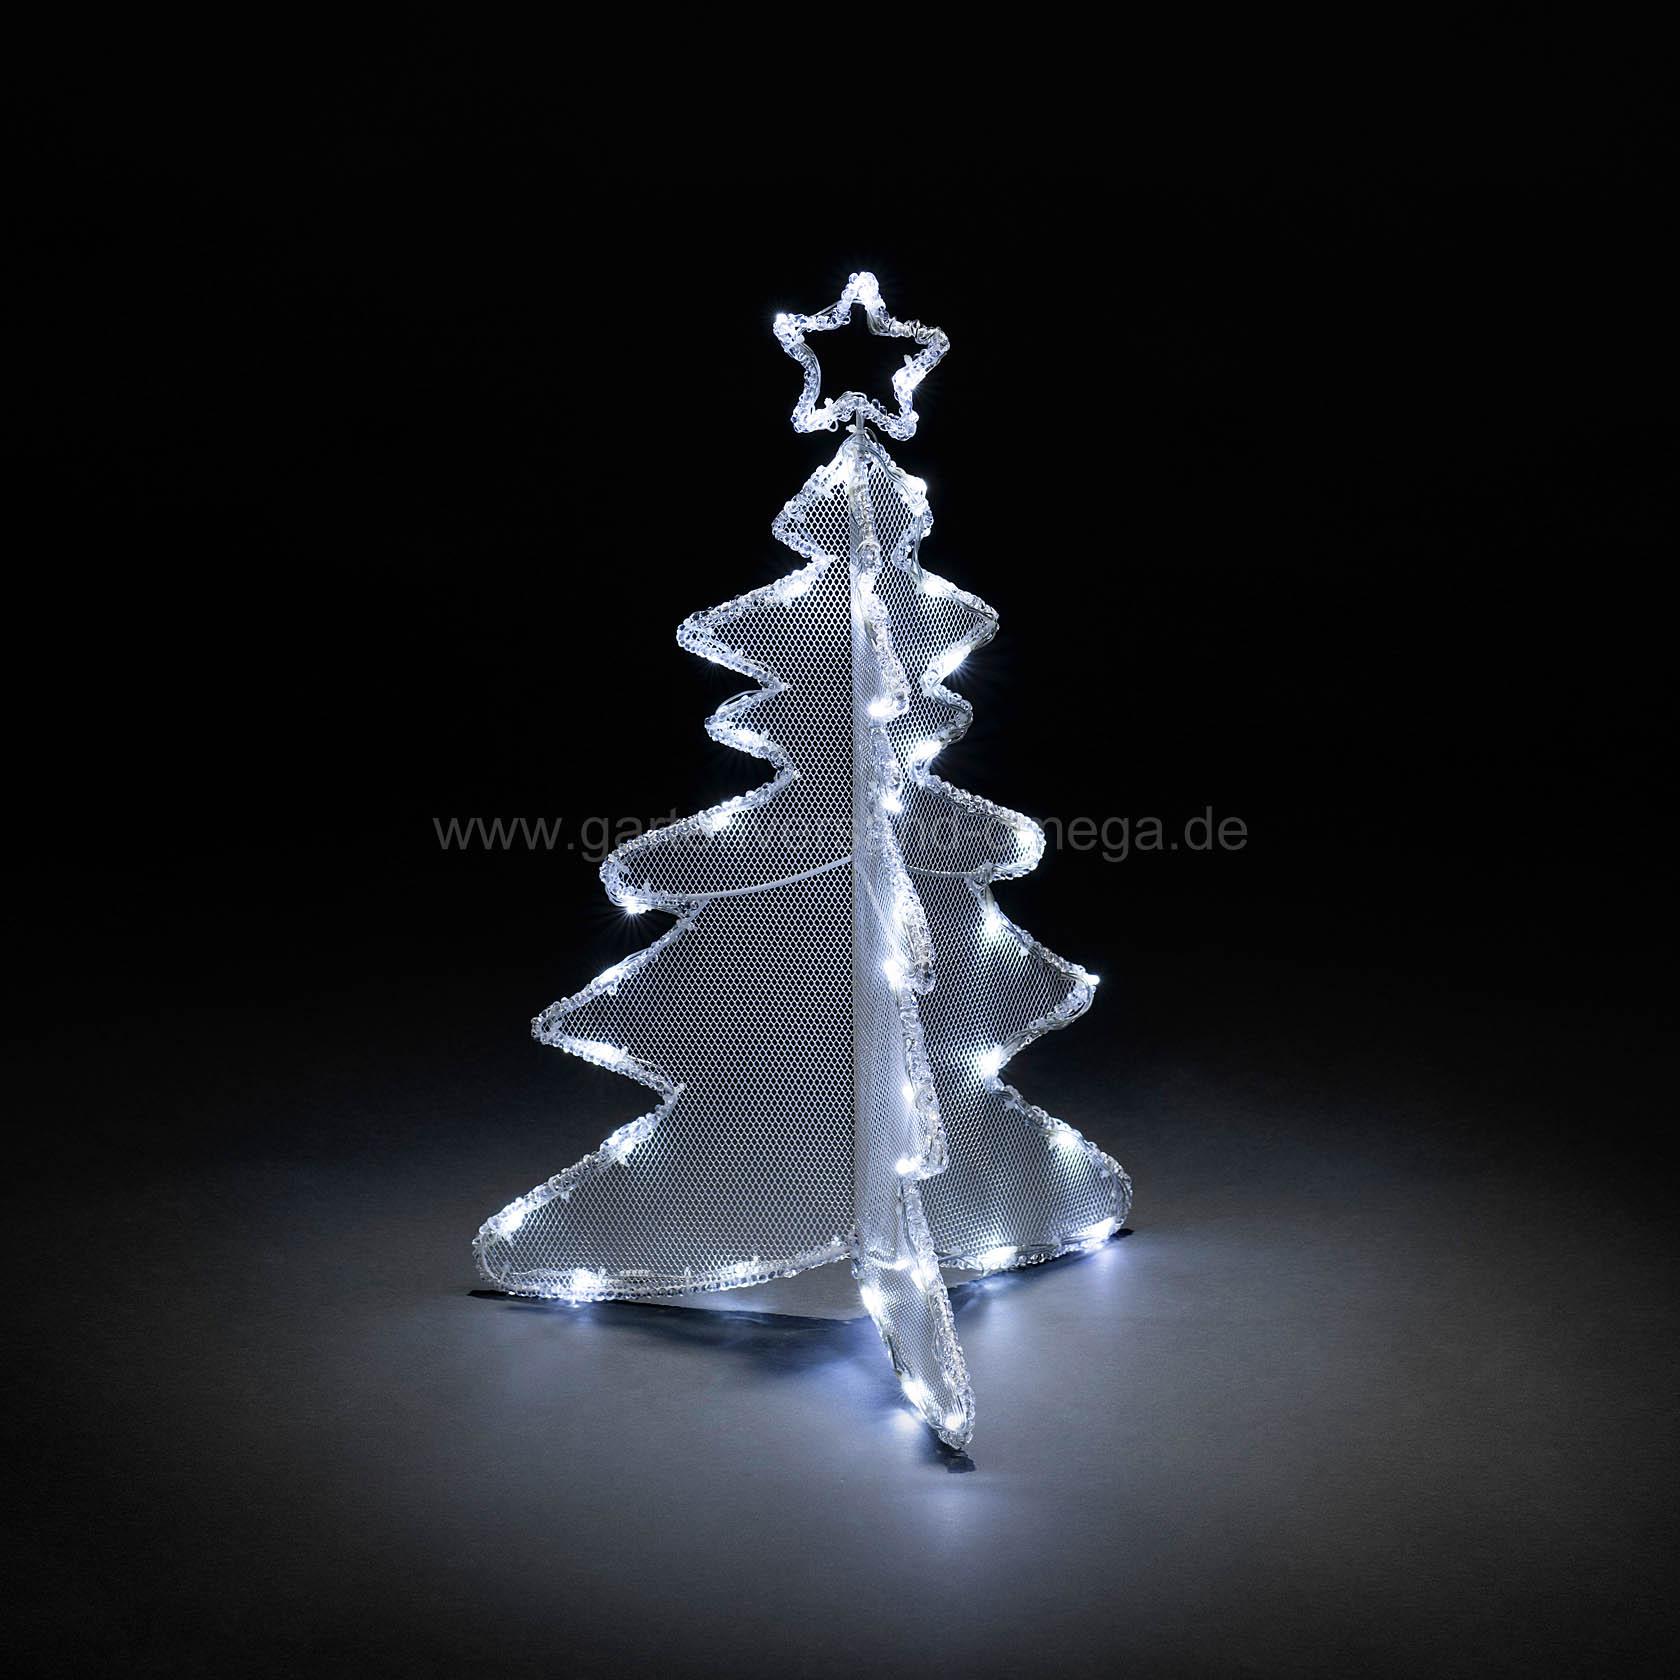 3d led acryl tannenbaum 60cm led tannenbaum kalt wei e weihnachtsbeleuchtung led. Black Bedroom Furniture Sets. Home Design Ideas